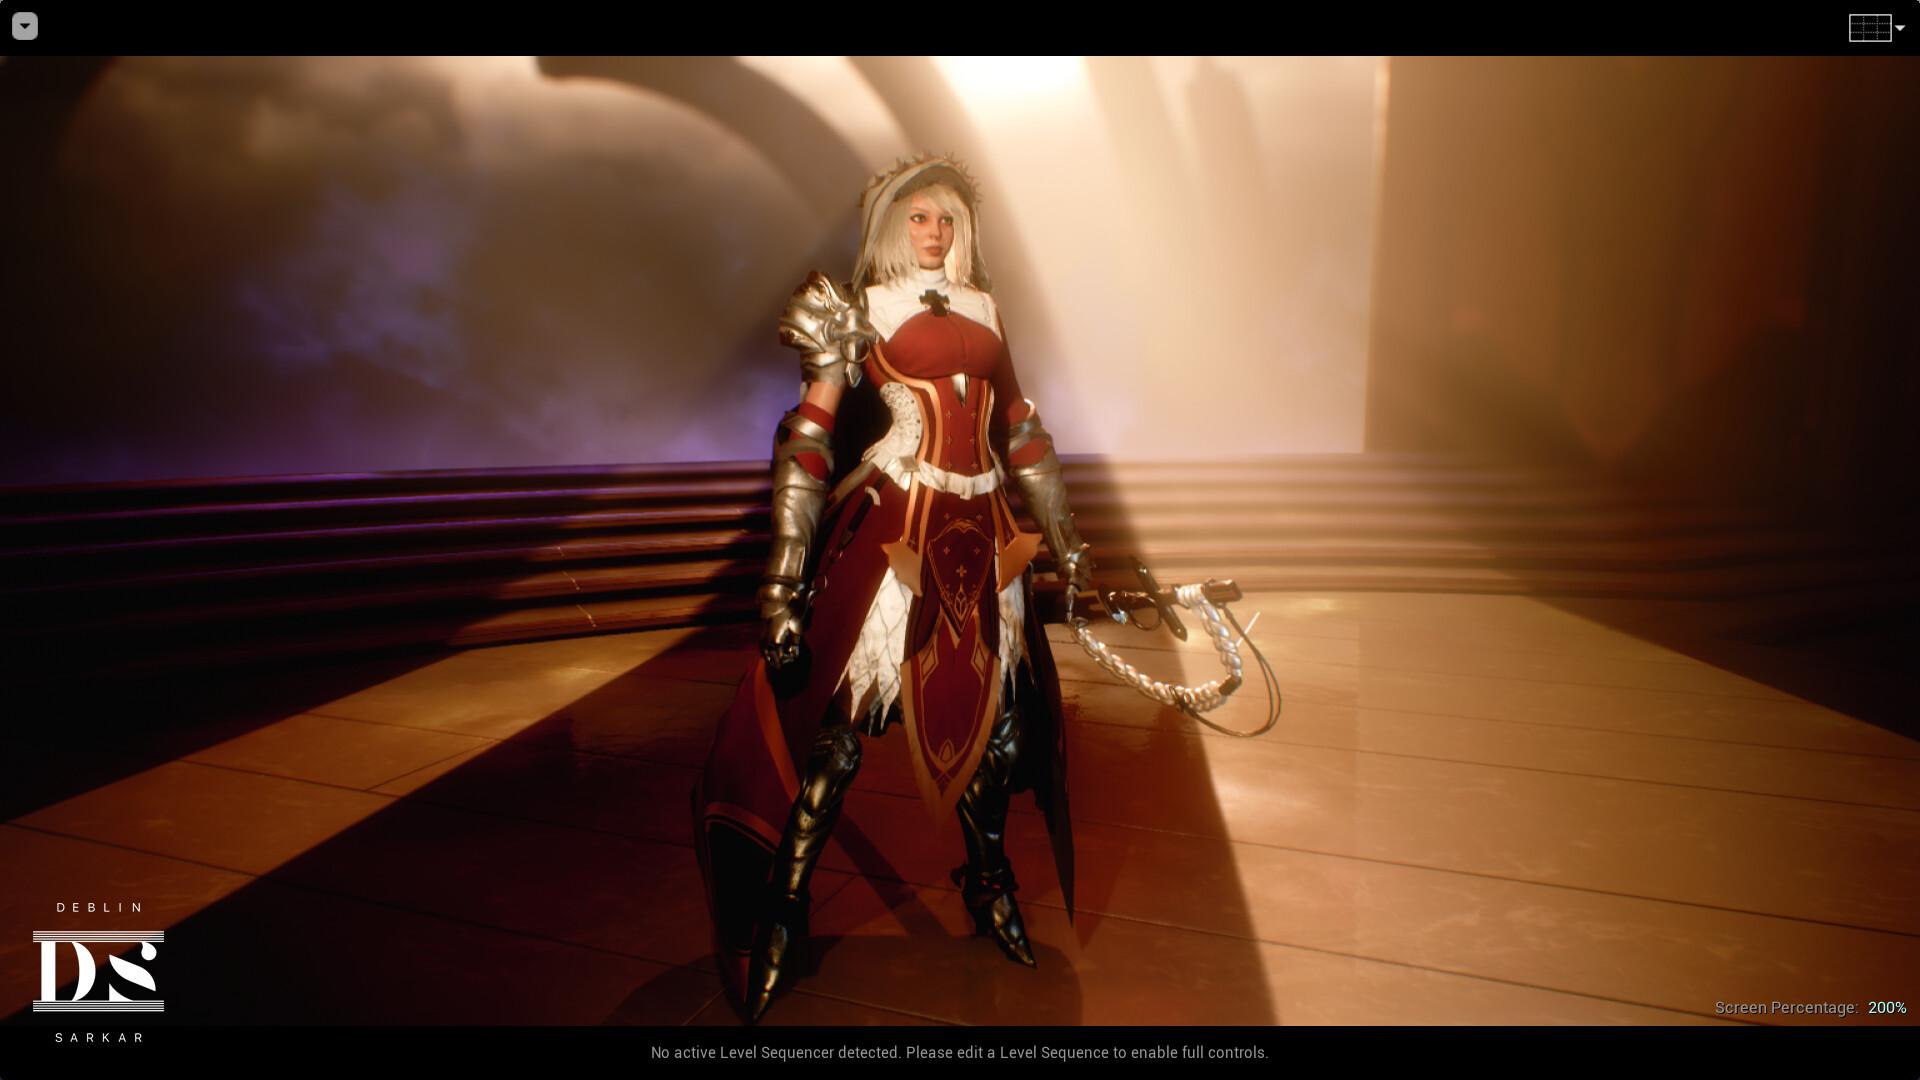 ArtStation - Seraphina - Battle Nun (Unreal Engine 4 22